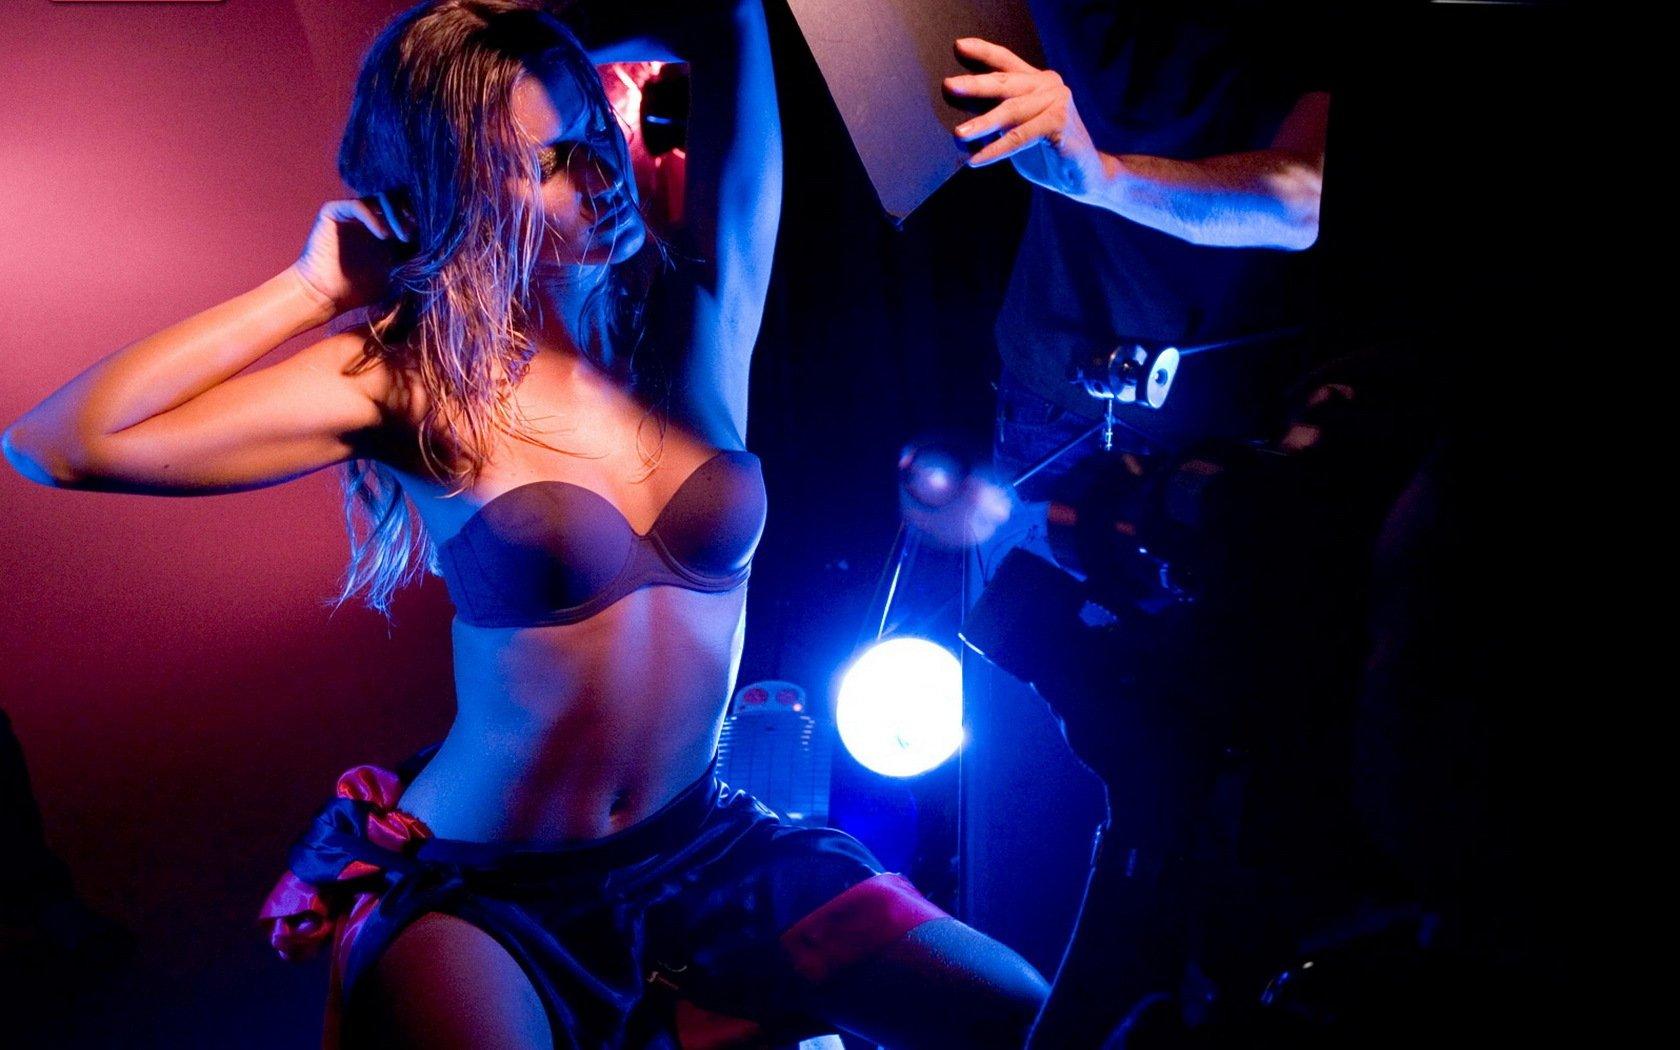 Брюнетка танцующая на танцполе в ночном клубе фото, вудман силой трахнул тощую брюнетку